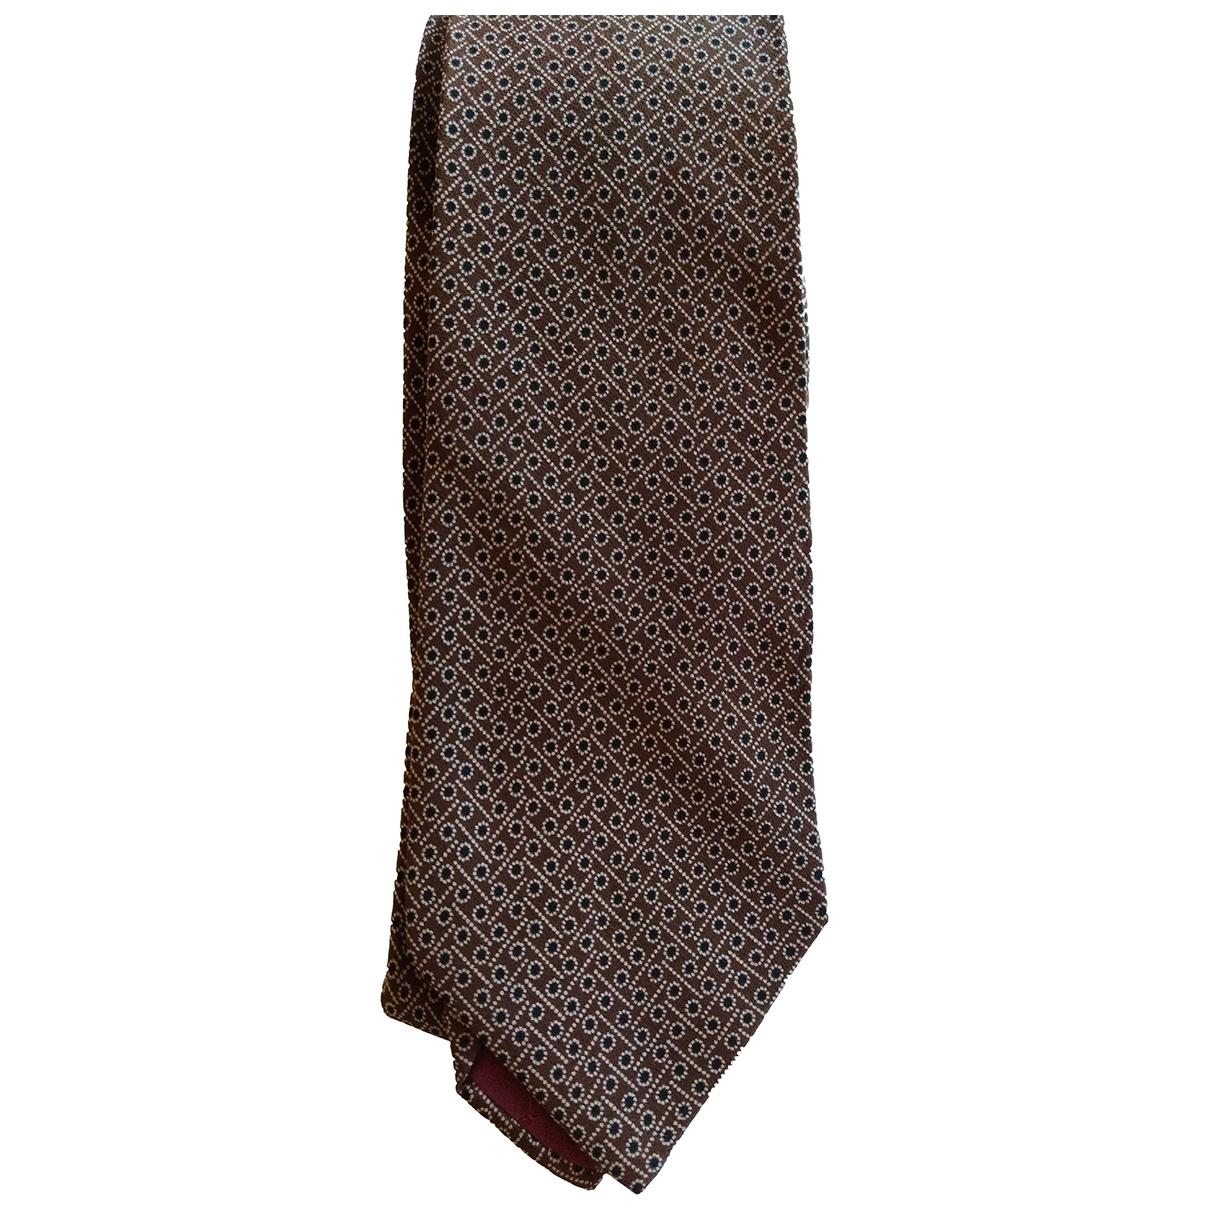 Yves Saint Laurent \N Krawatten in  Braun Seide